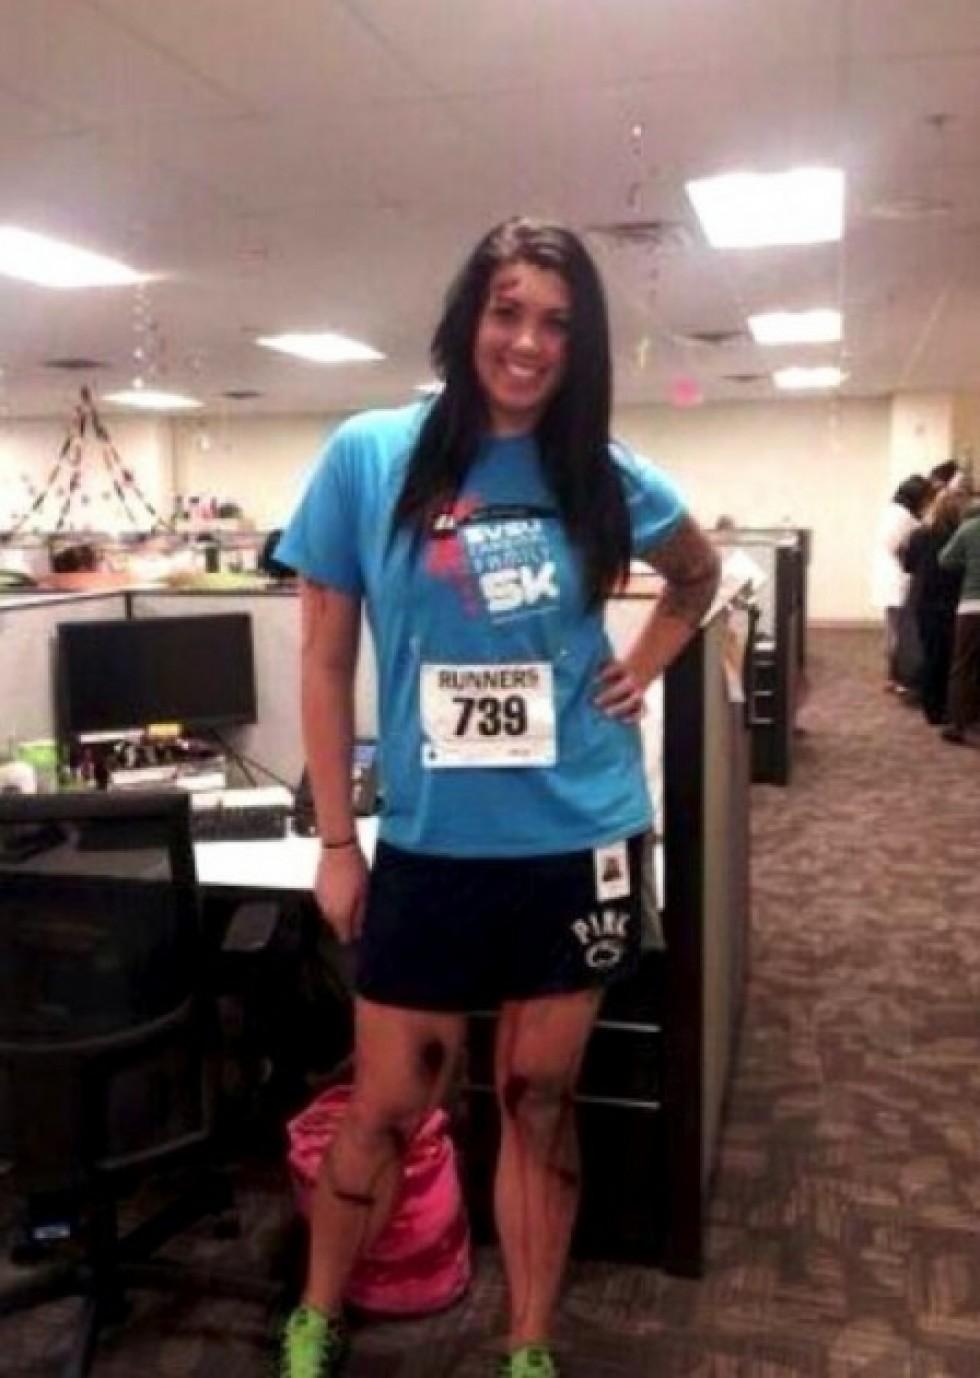 alicia lynch wears boston marathon bombing victim costume